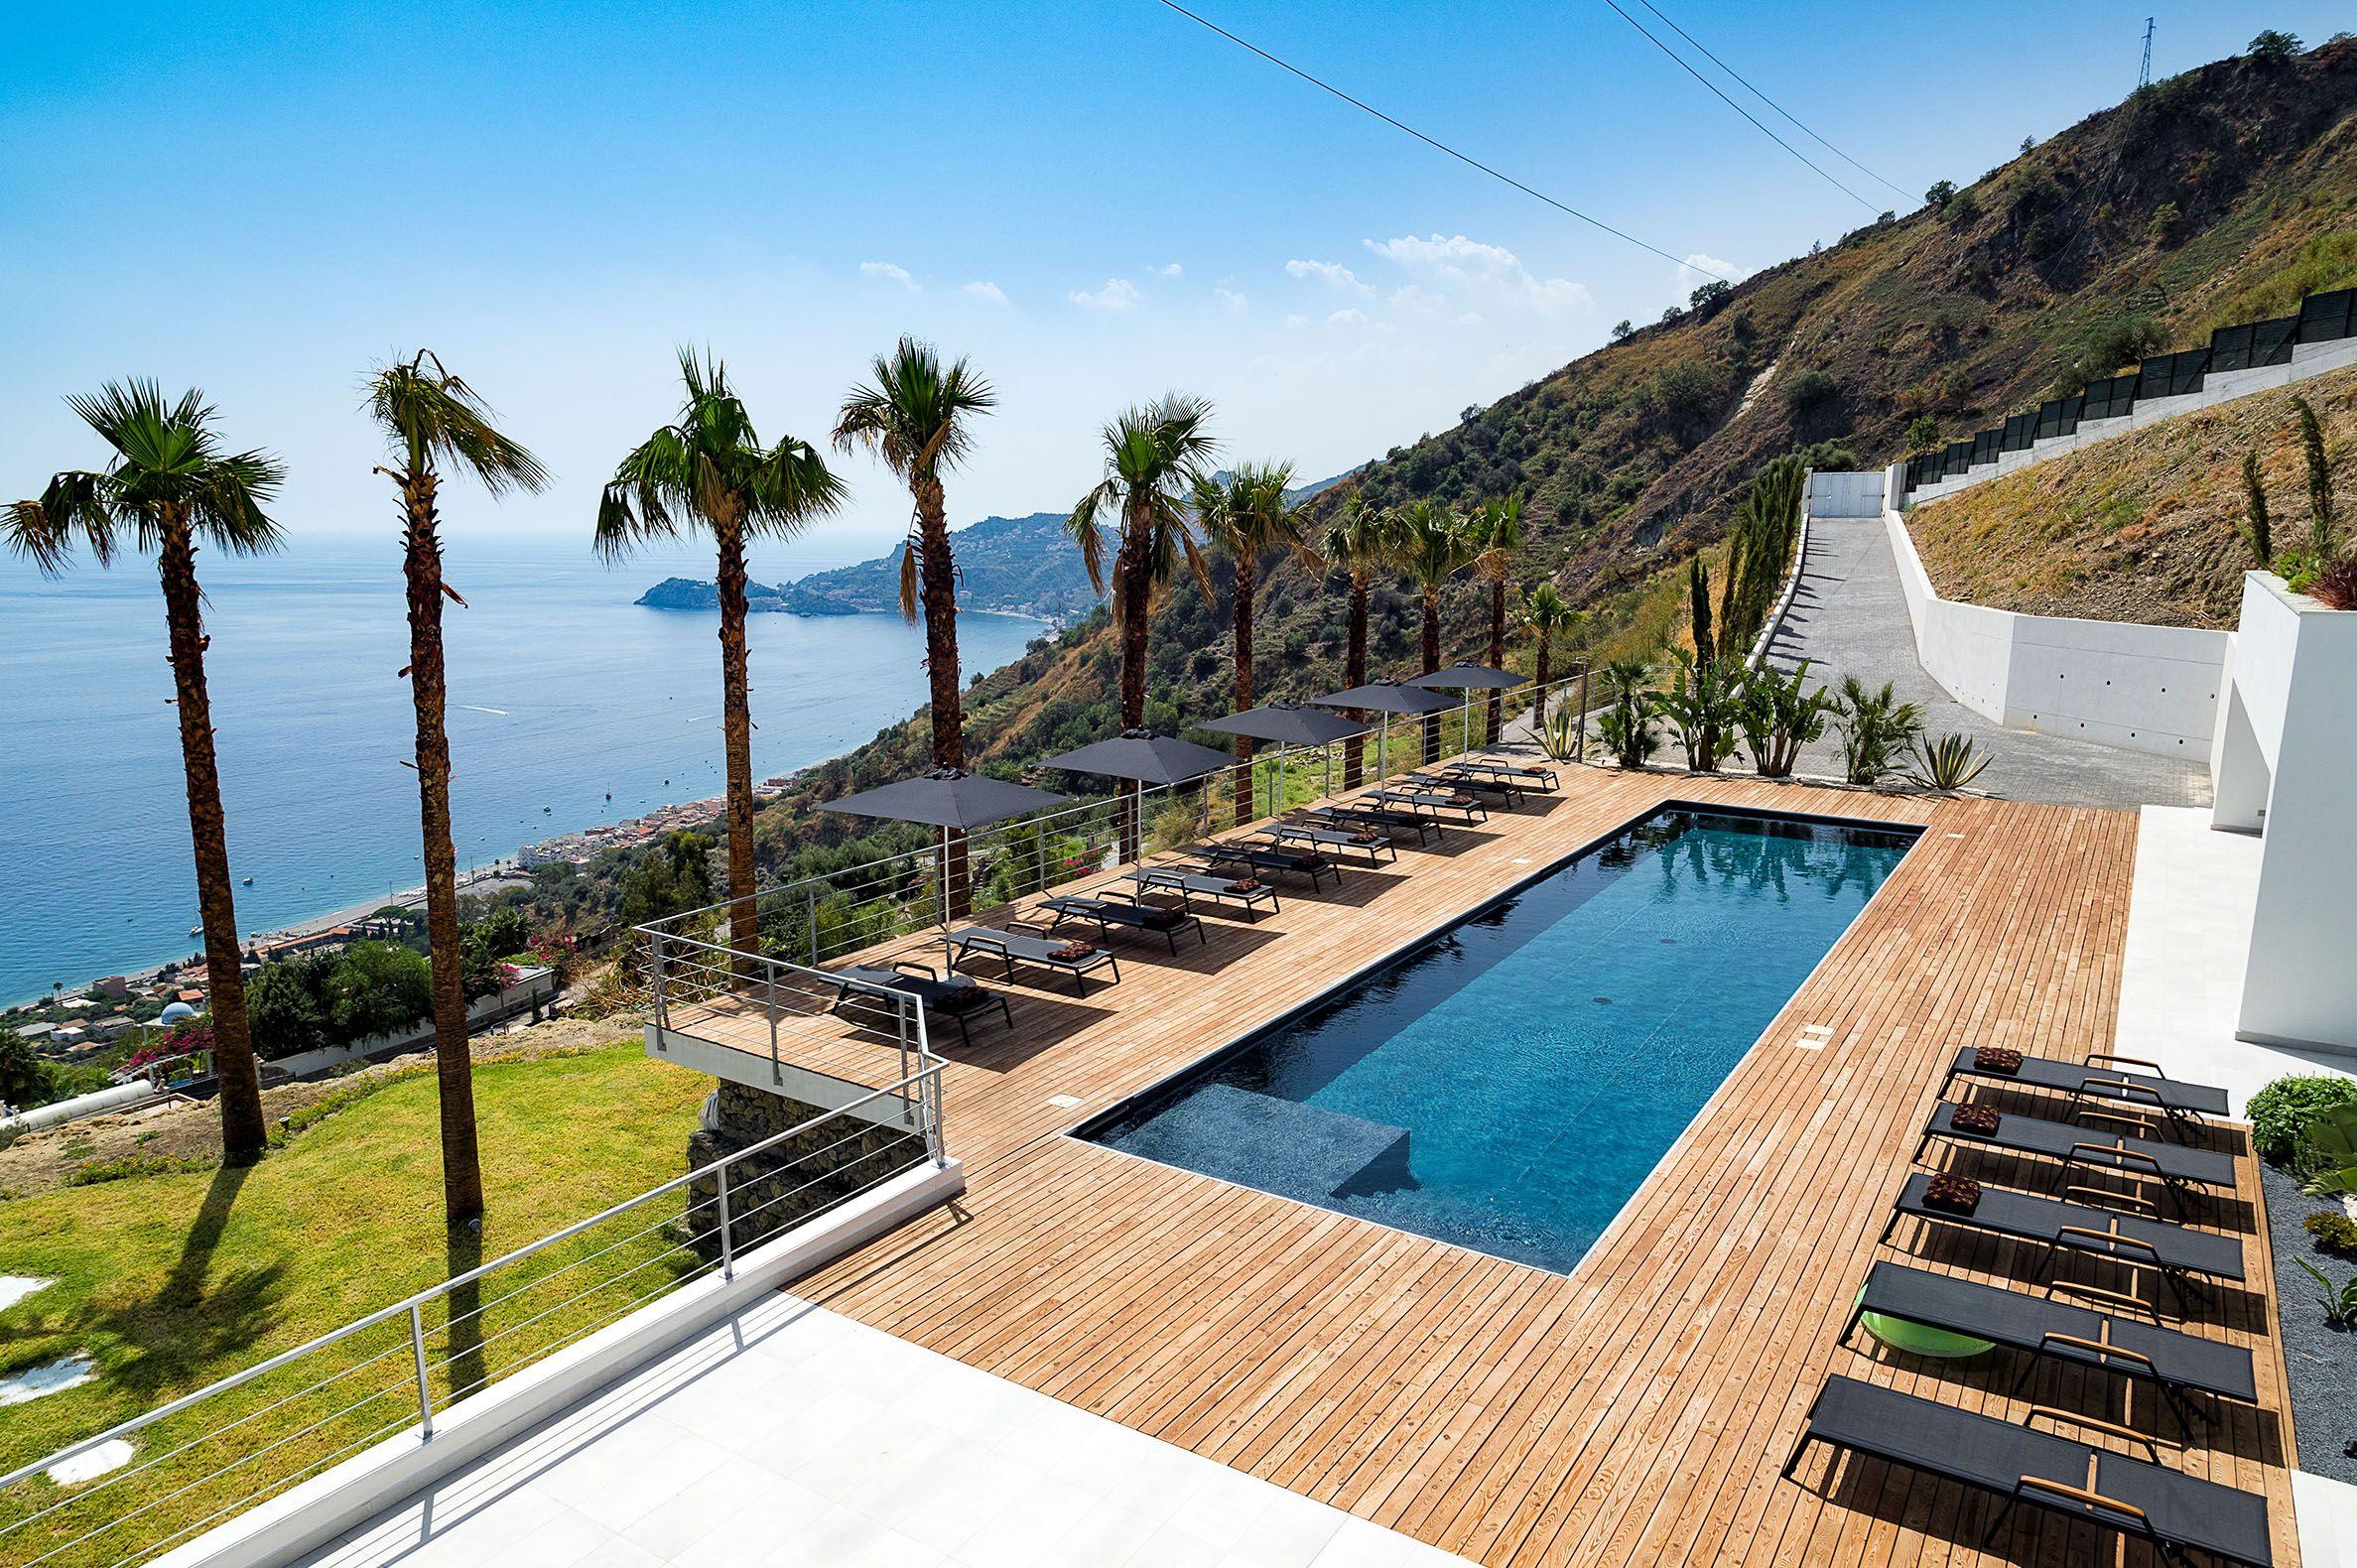 Aragona Www Homeinitaly Com Homes In Italy Vacation Villas Mountain Resort Architecture